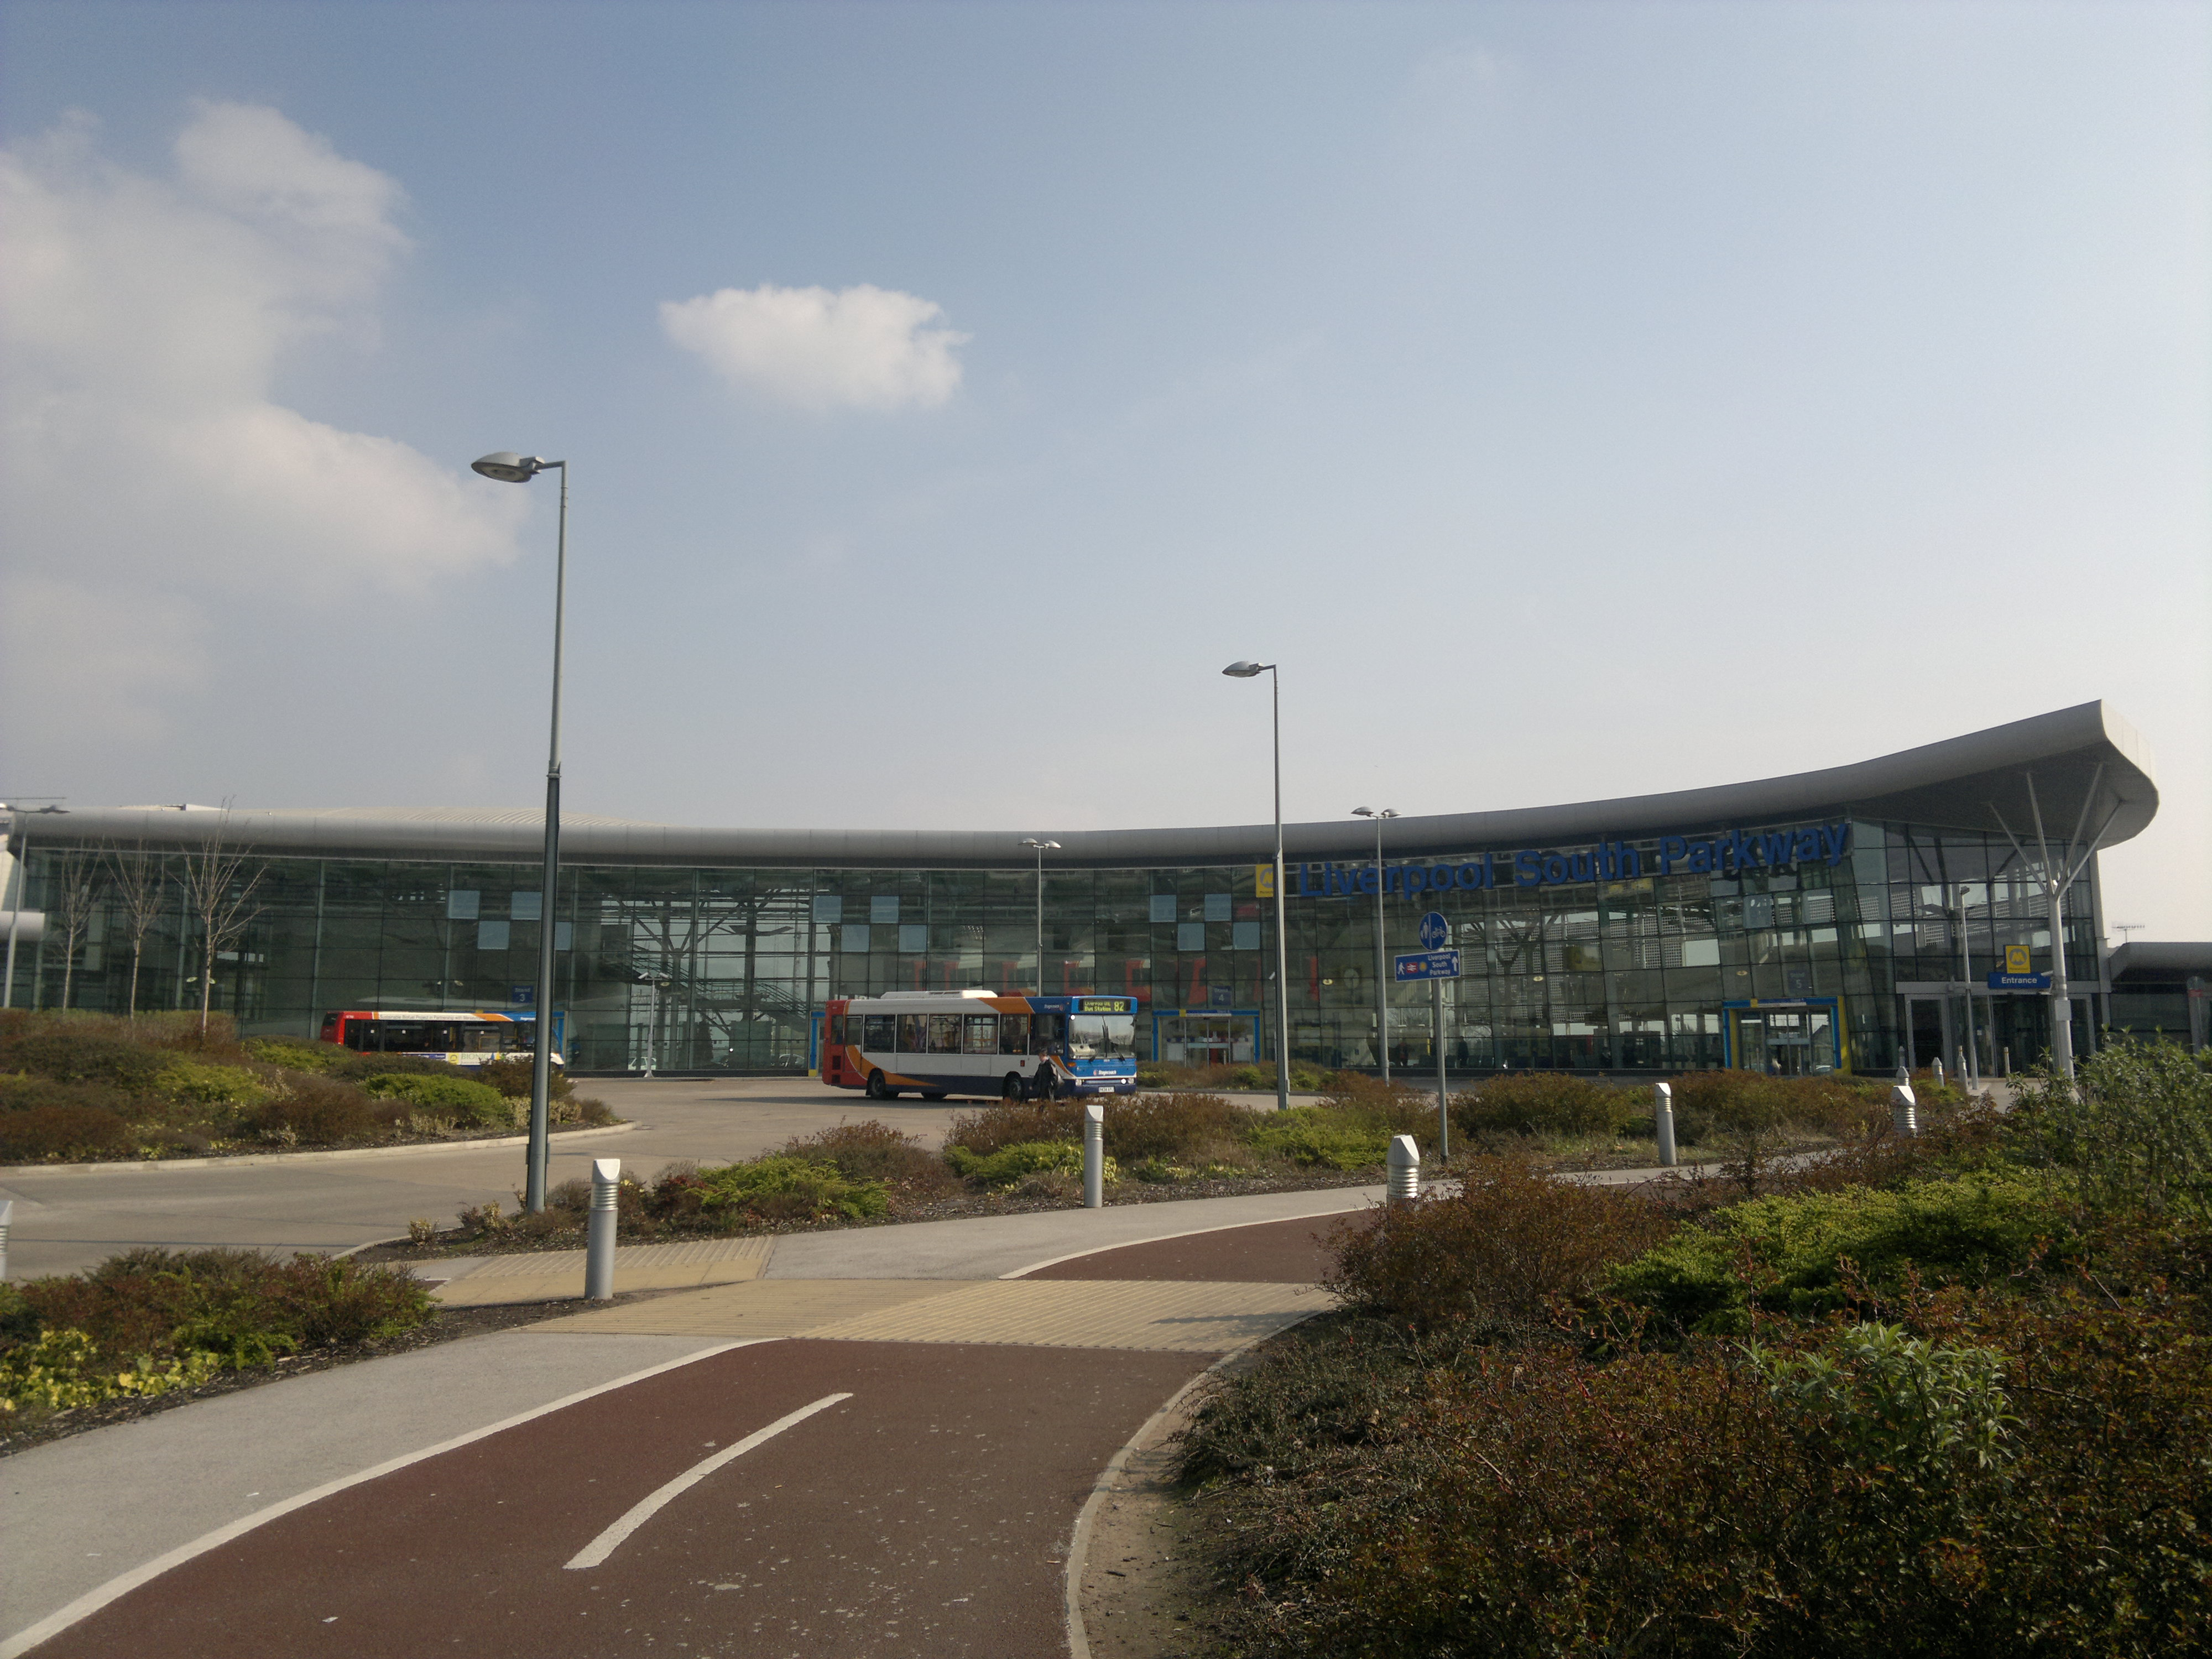 Modern railway station in Liverppol